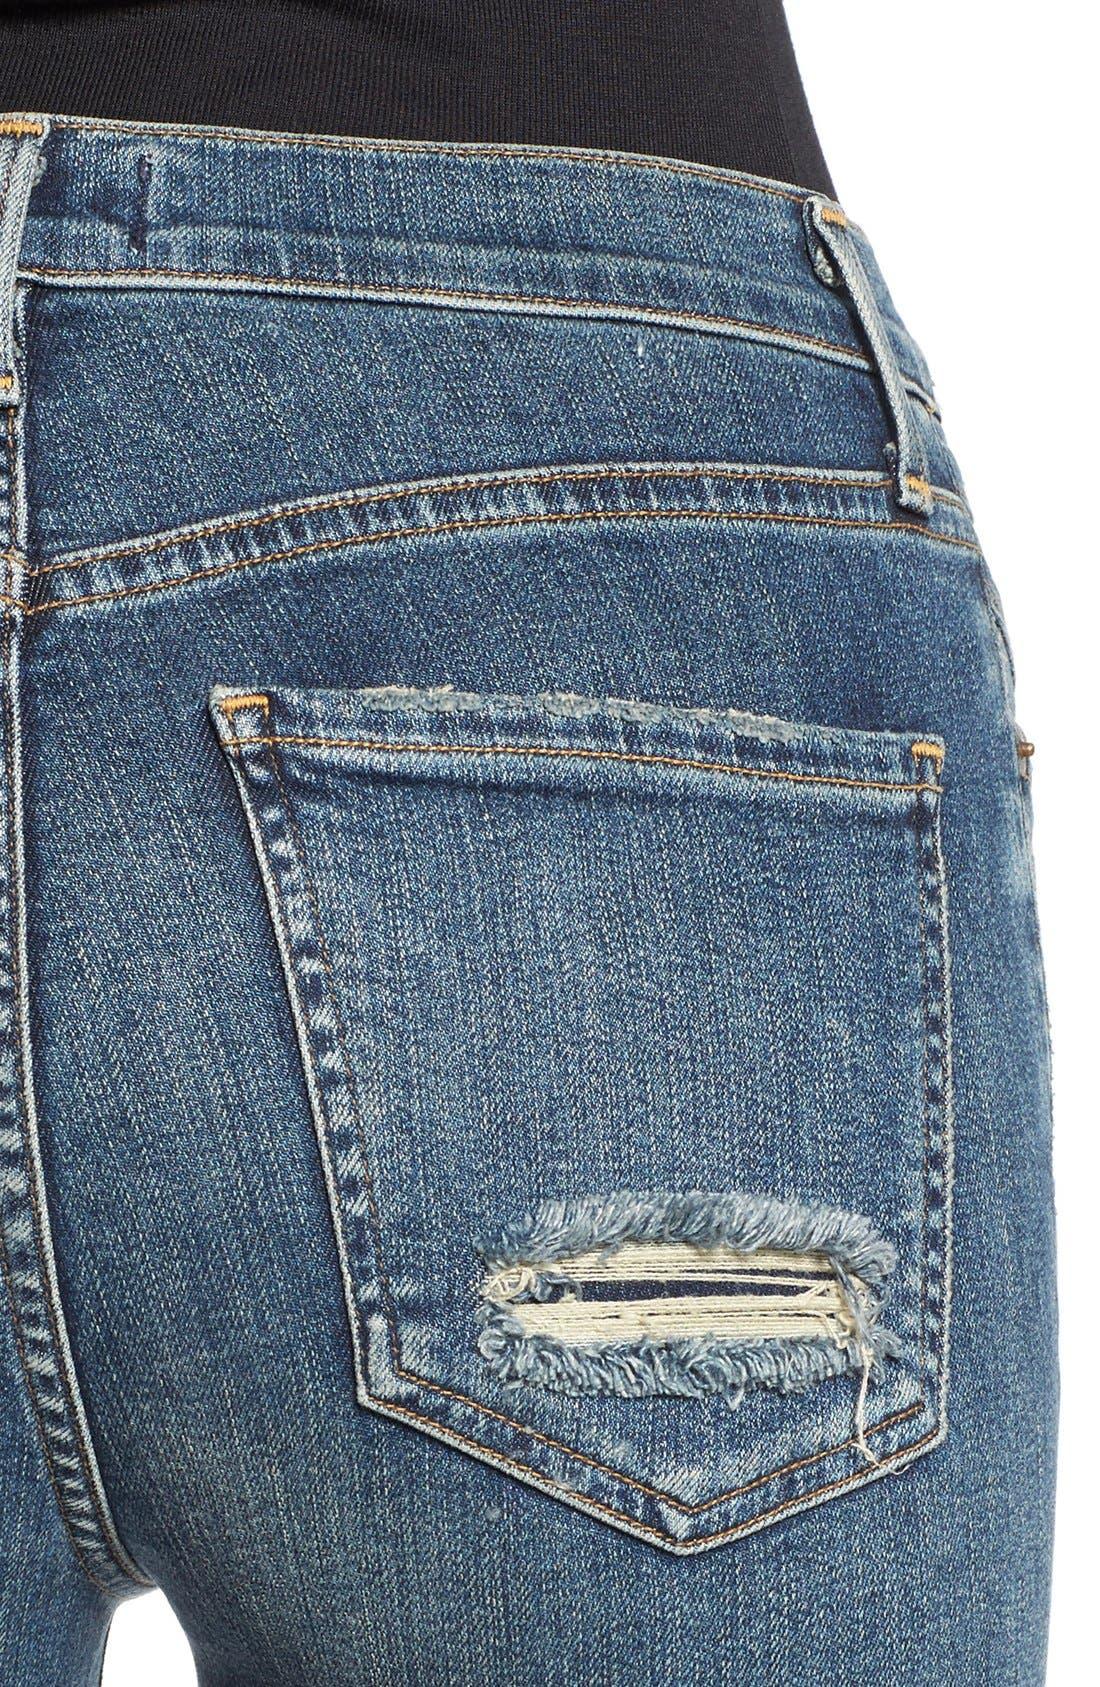 'Sophie' High Rise Skinny Jeans,                             Alternate thumbnail 4, color,                             KANSAS CITY